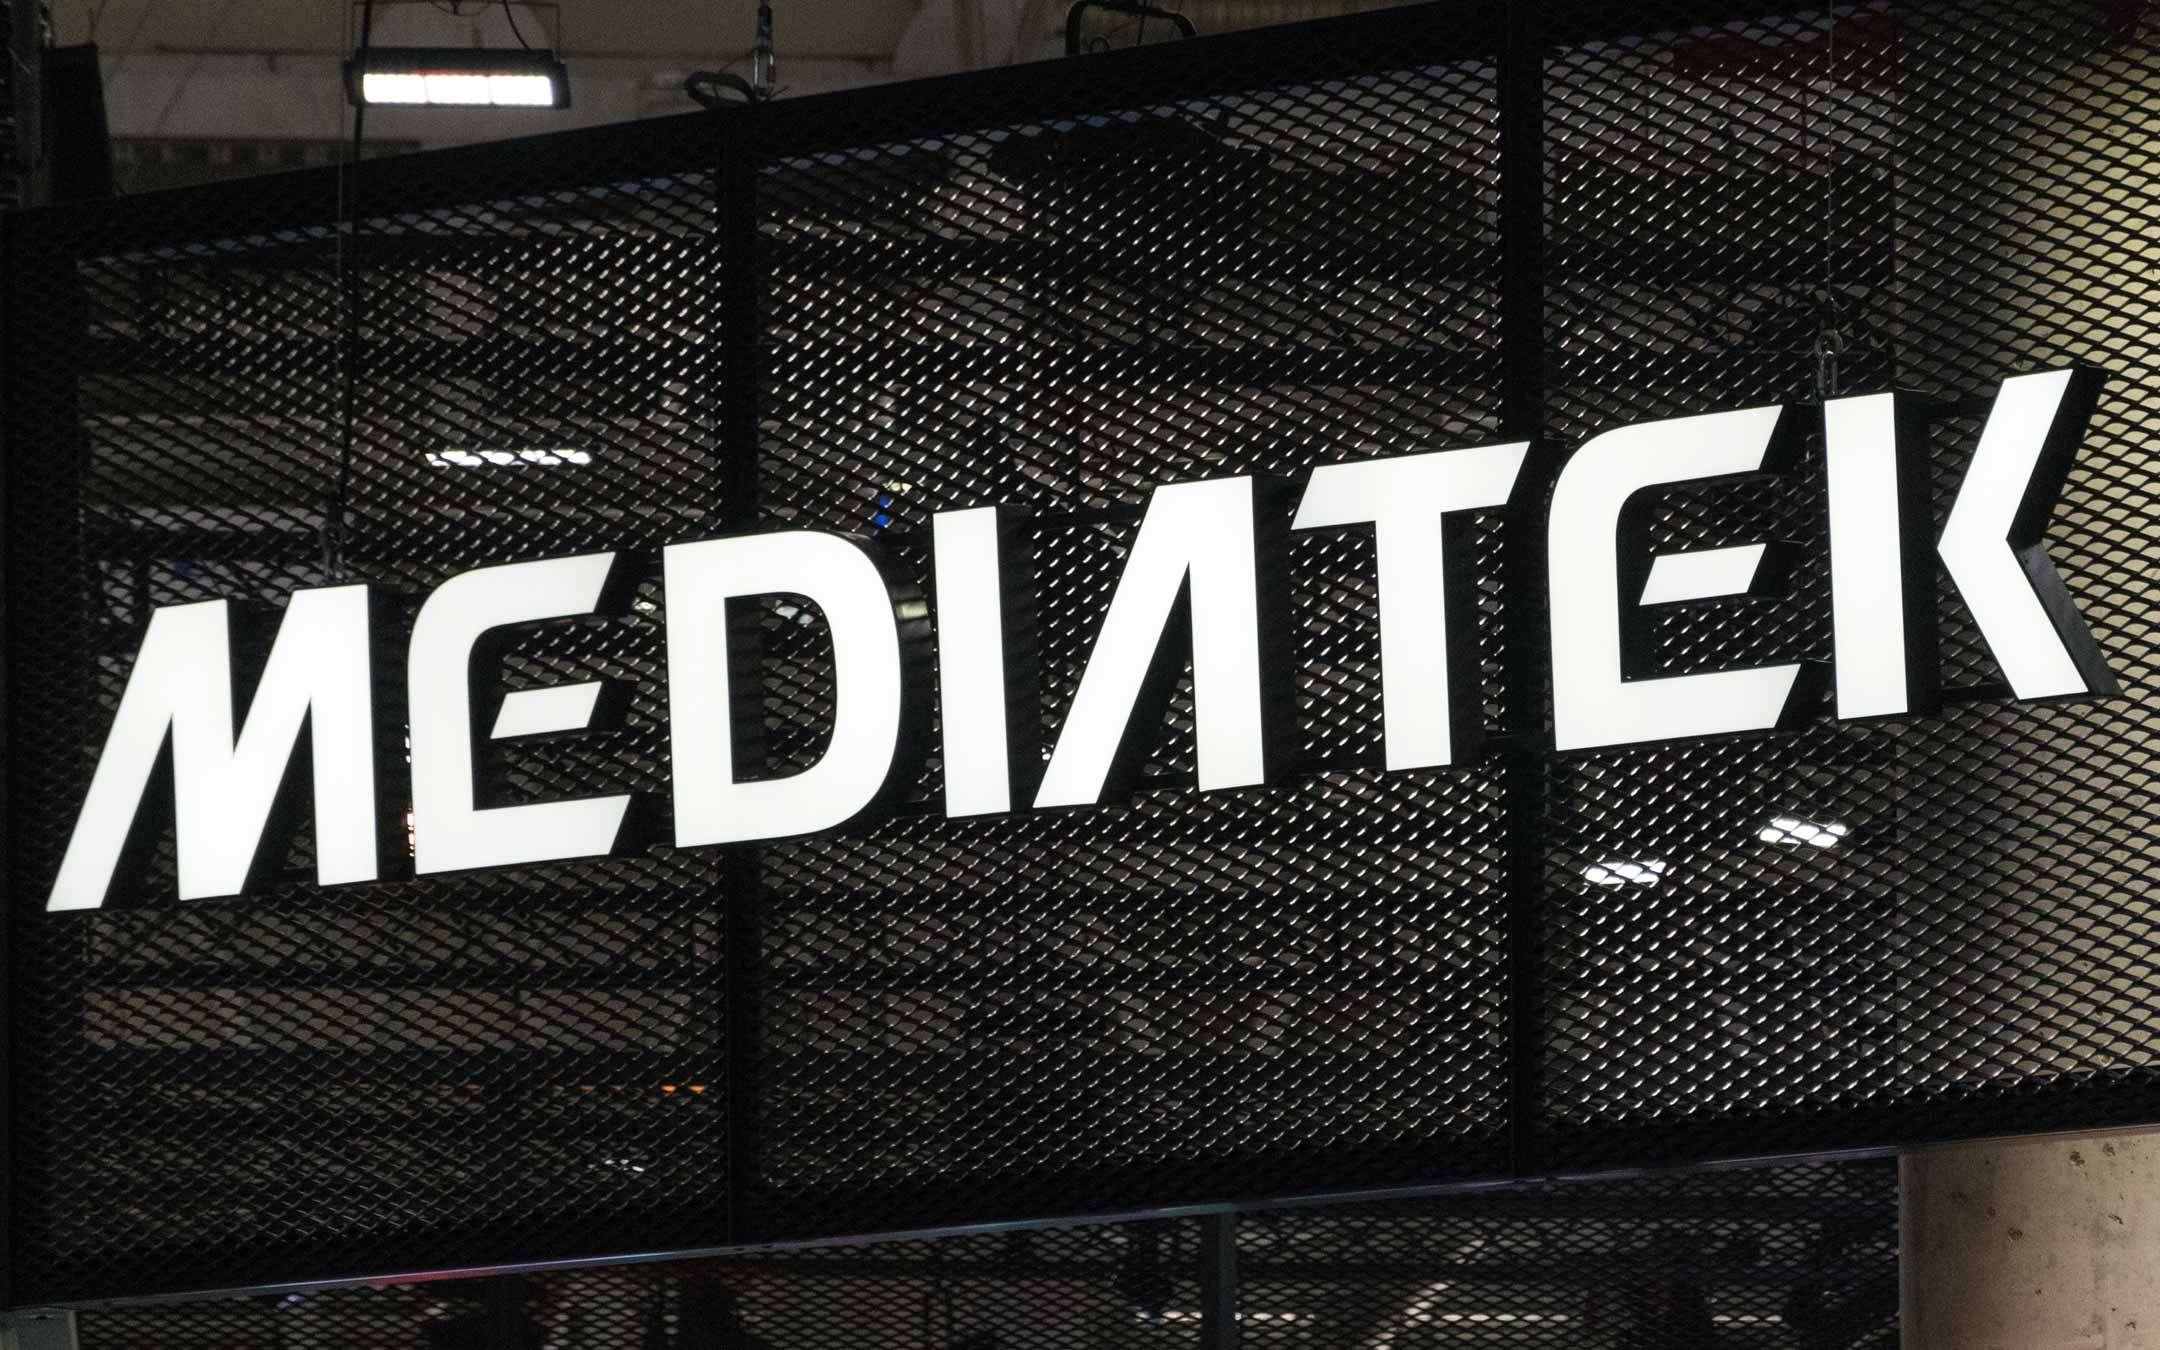 MediaTek in Finland to work on 6G